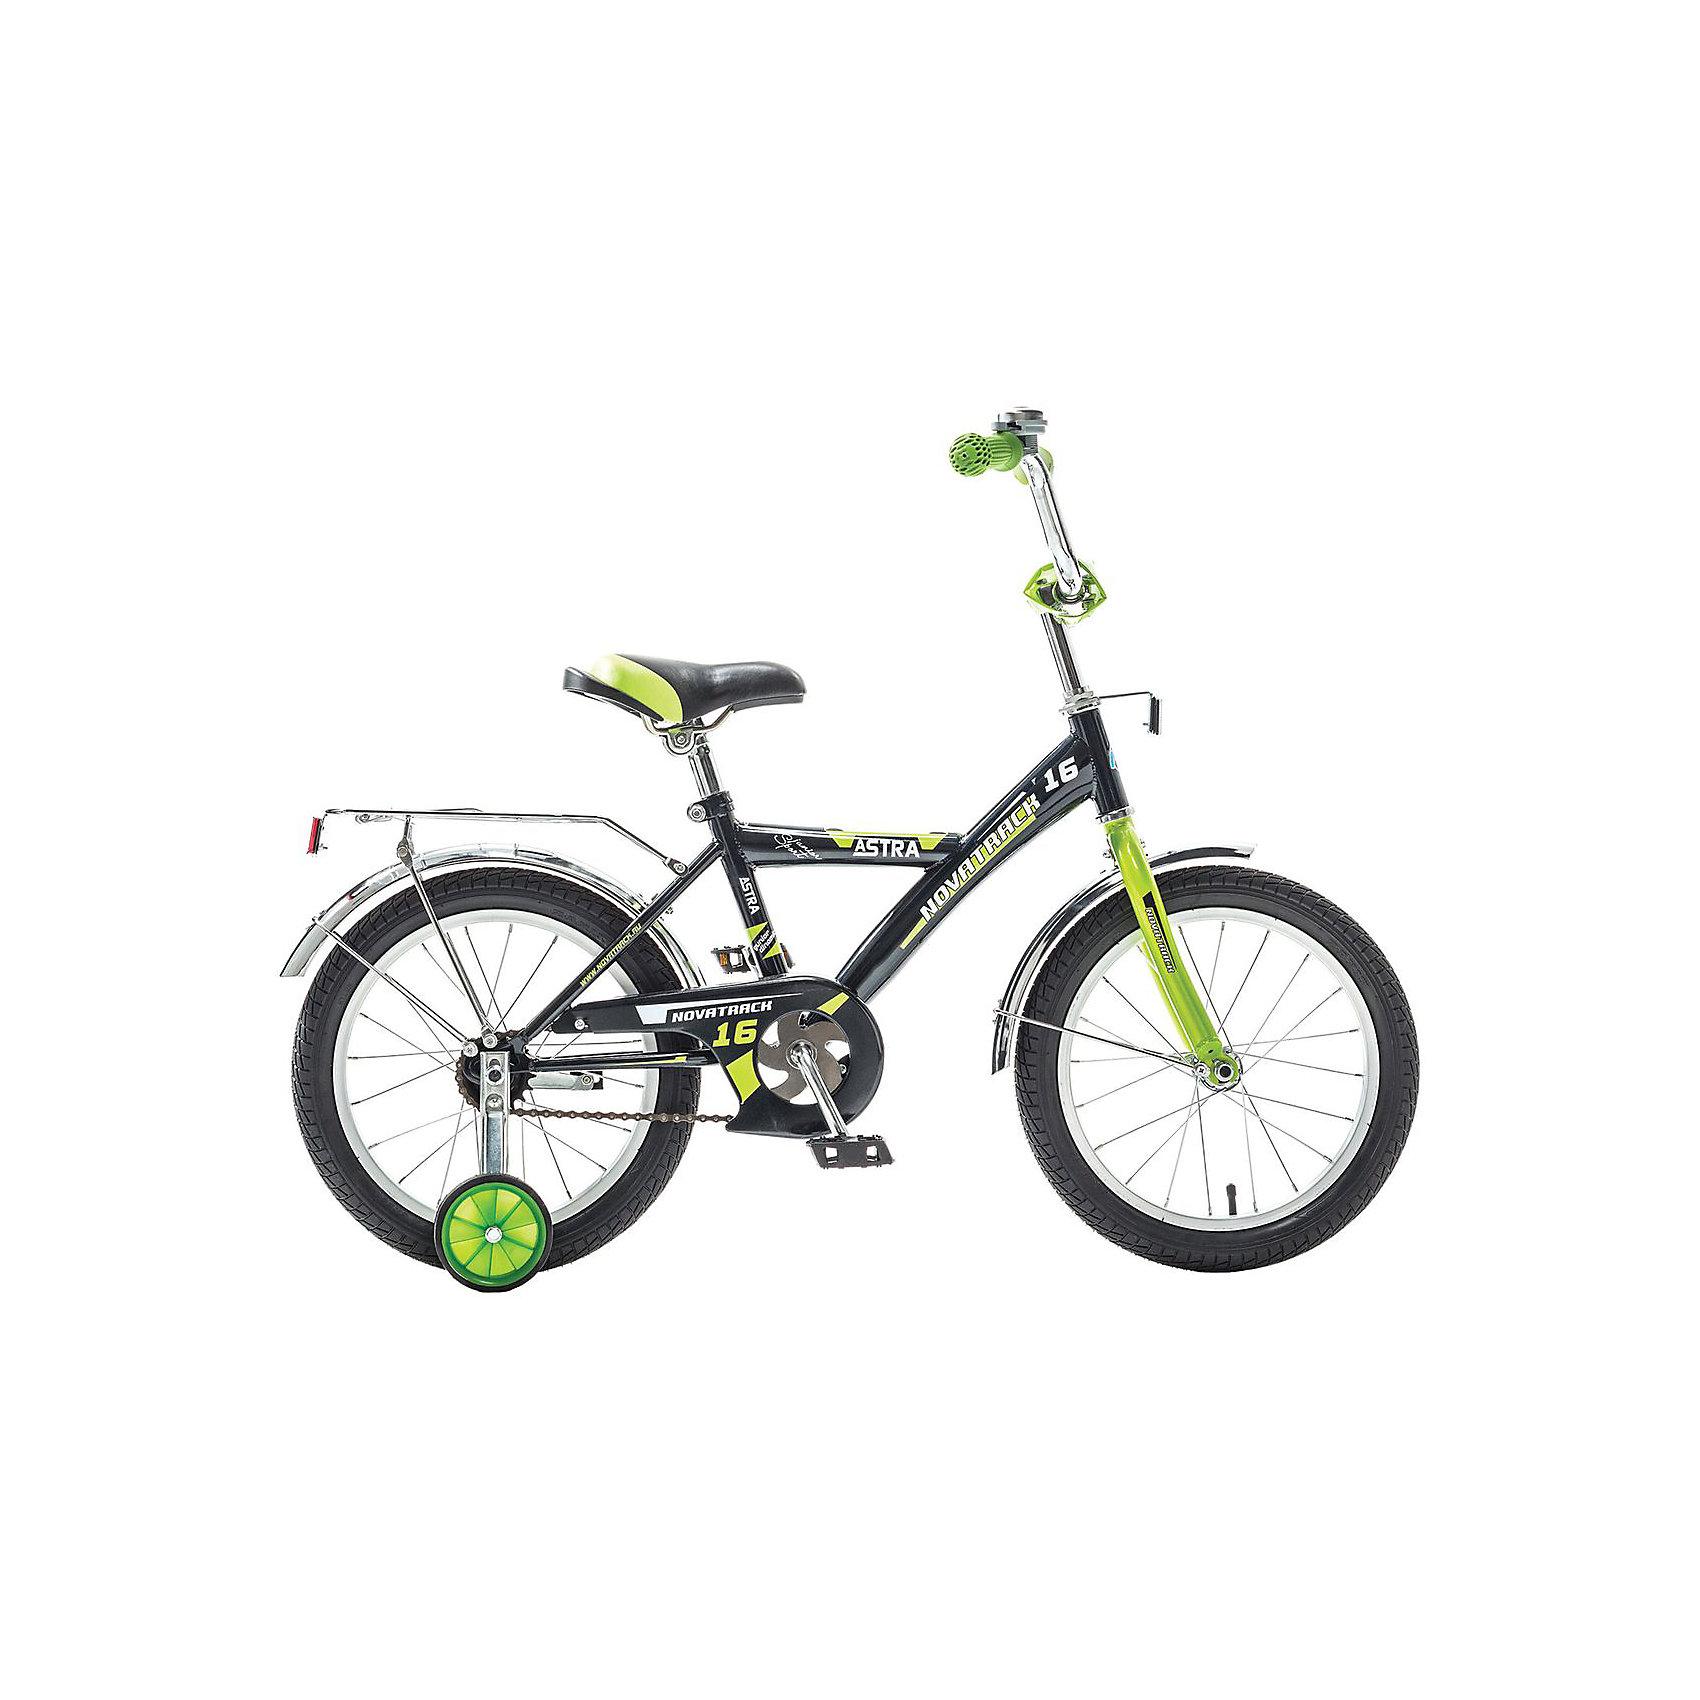 Фото 2 - Велосипед Novatrack Astra 16